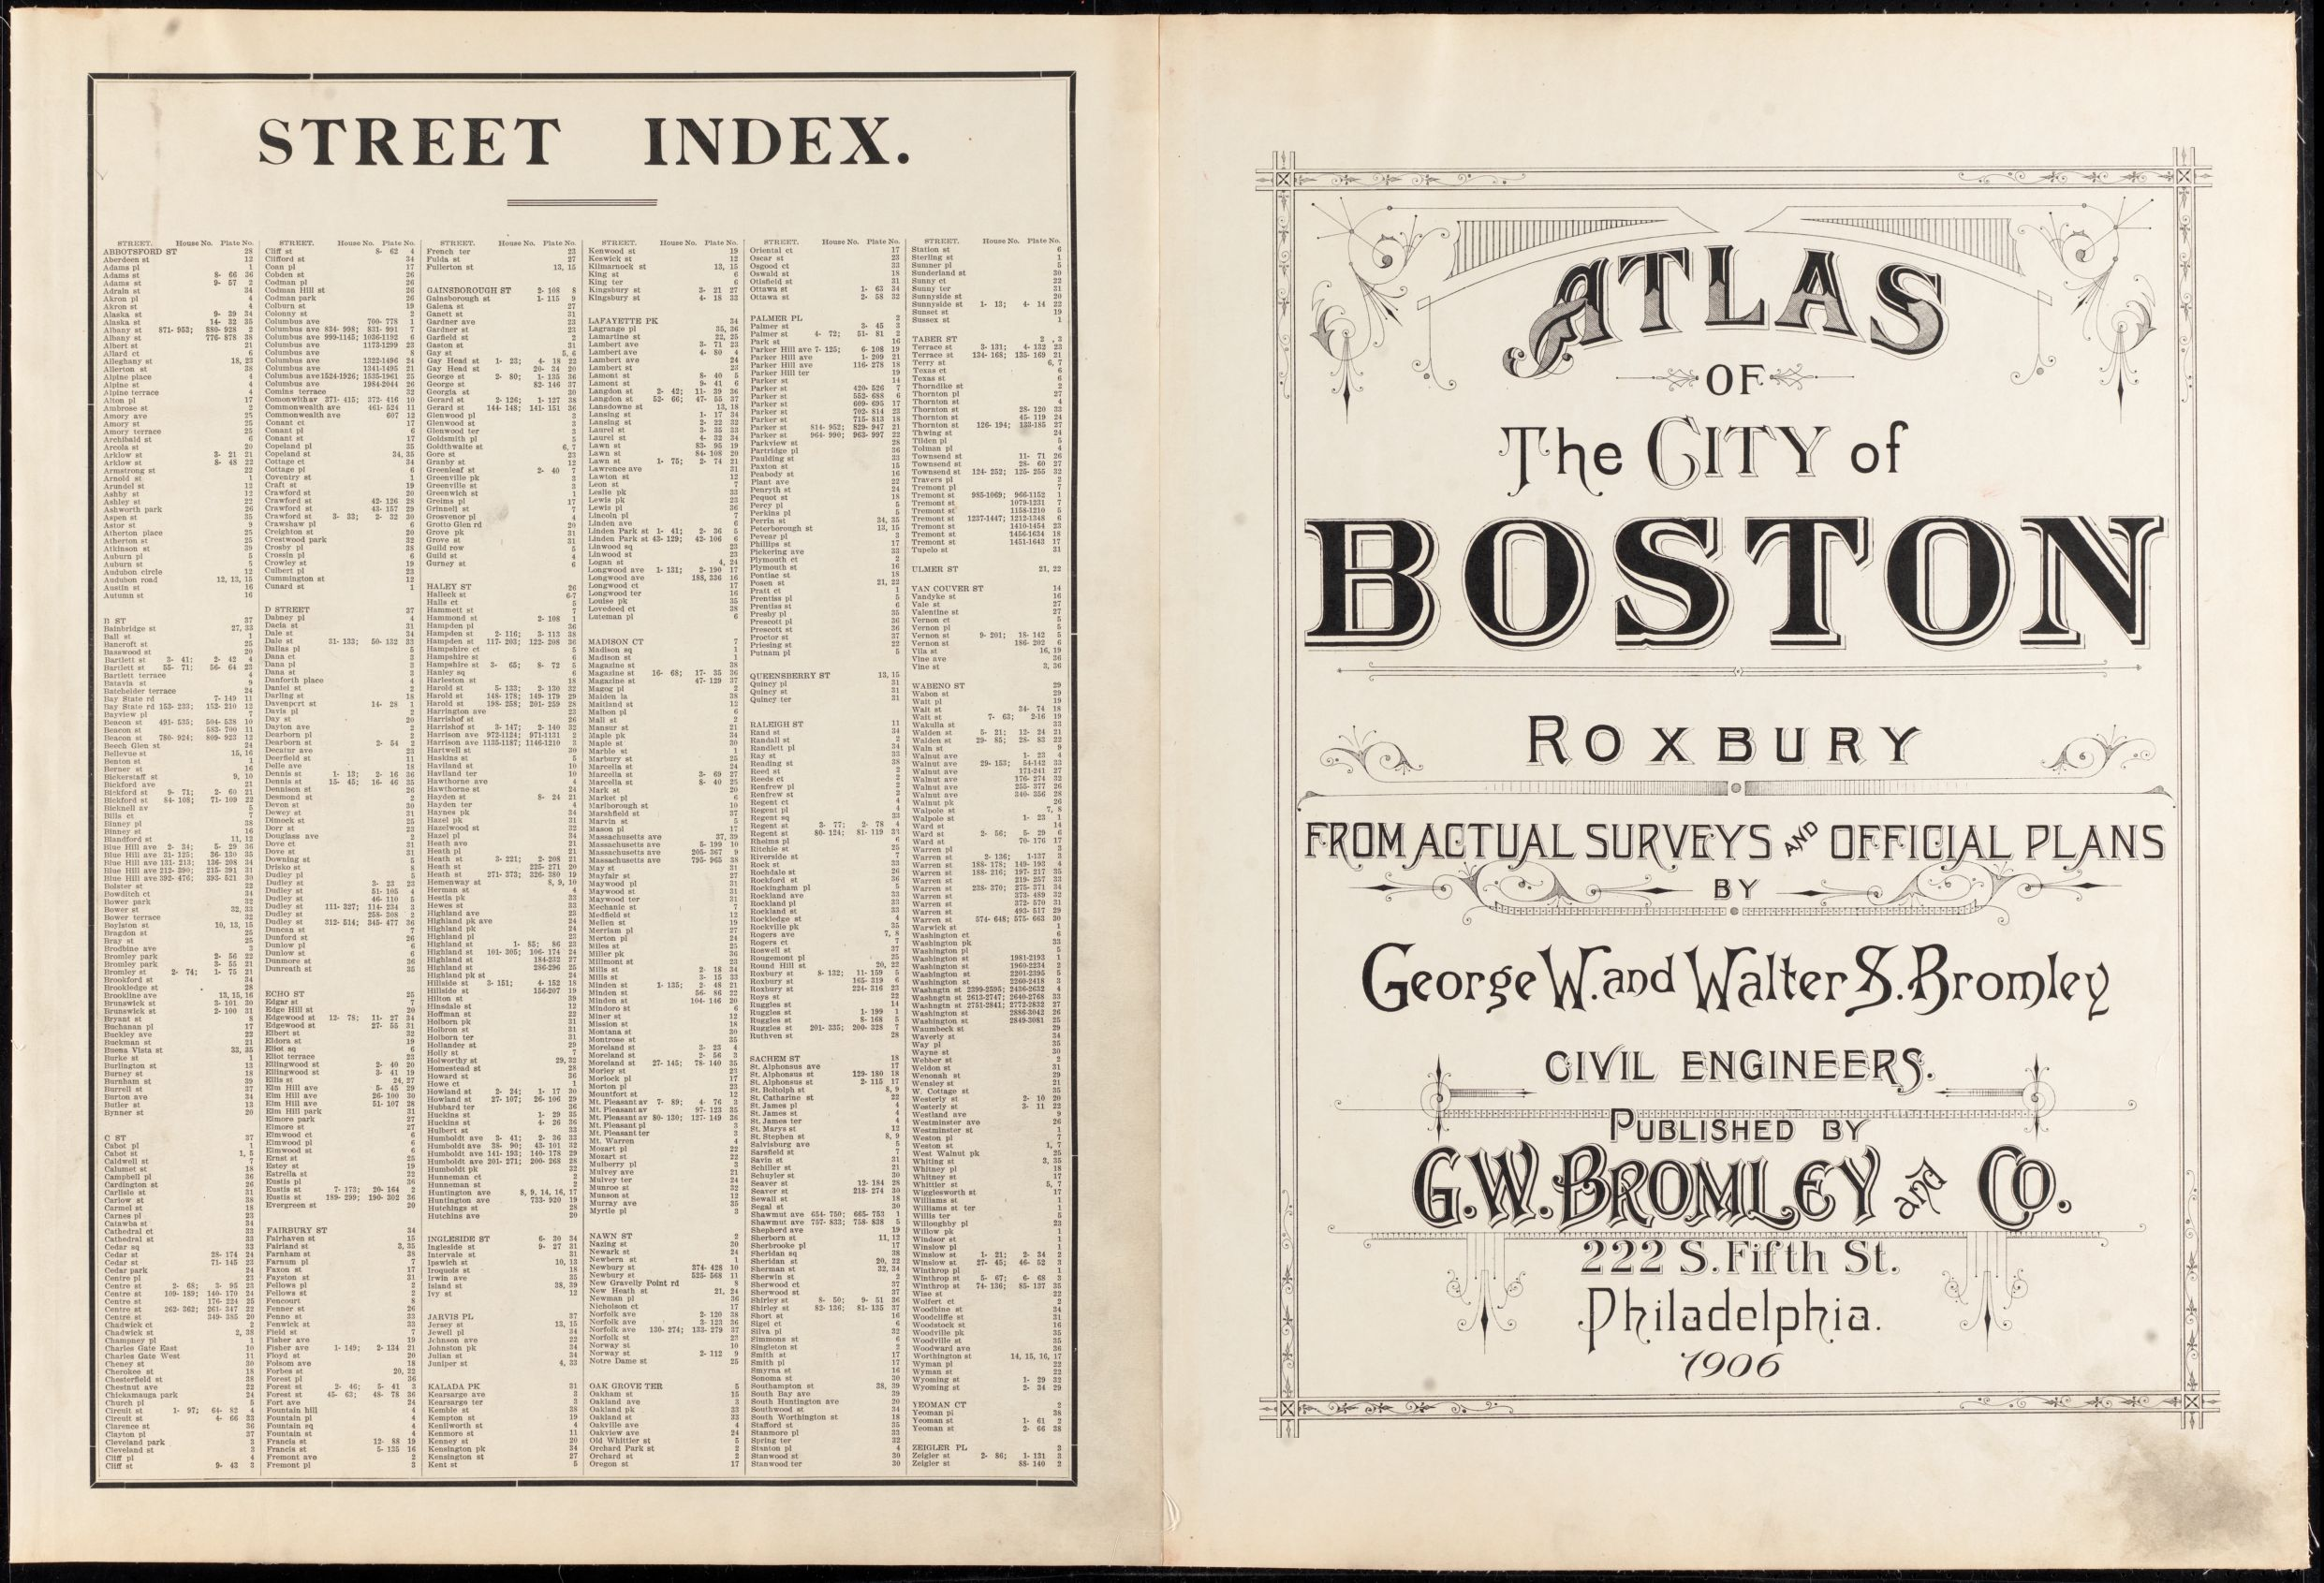 Atlas of the city of Boston : Roxbury